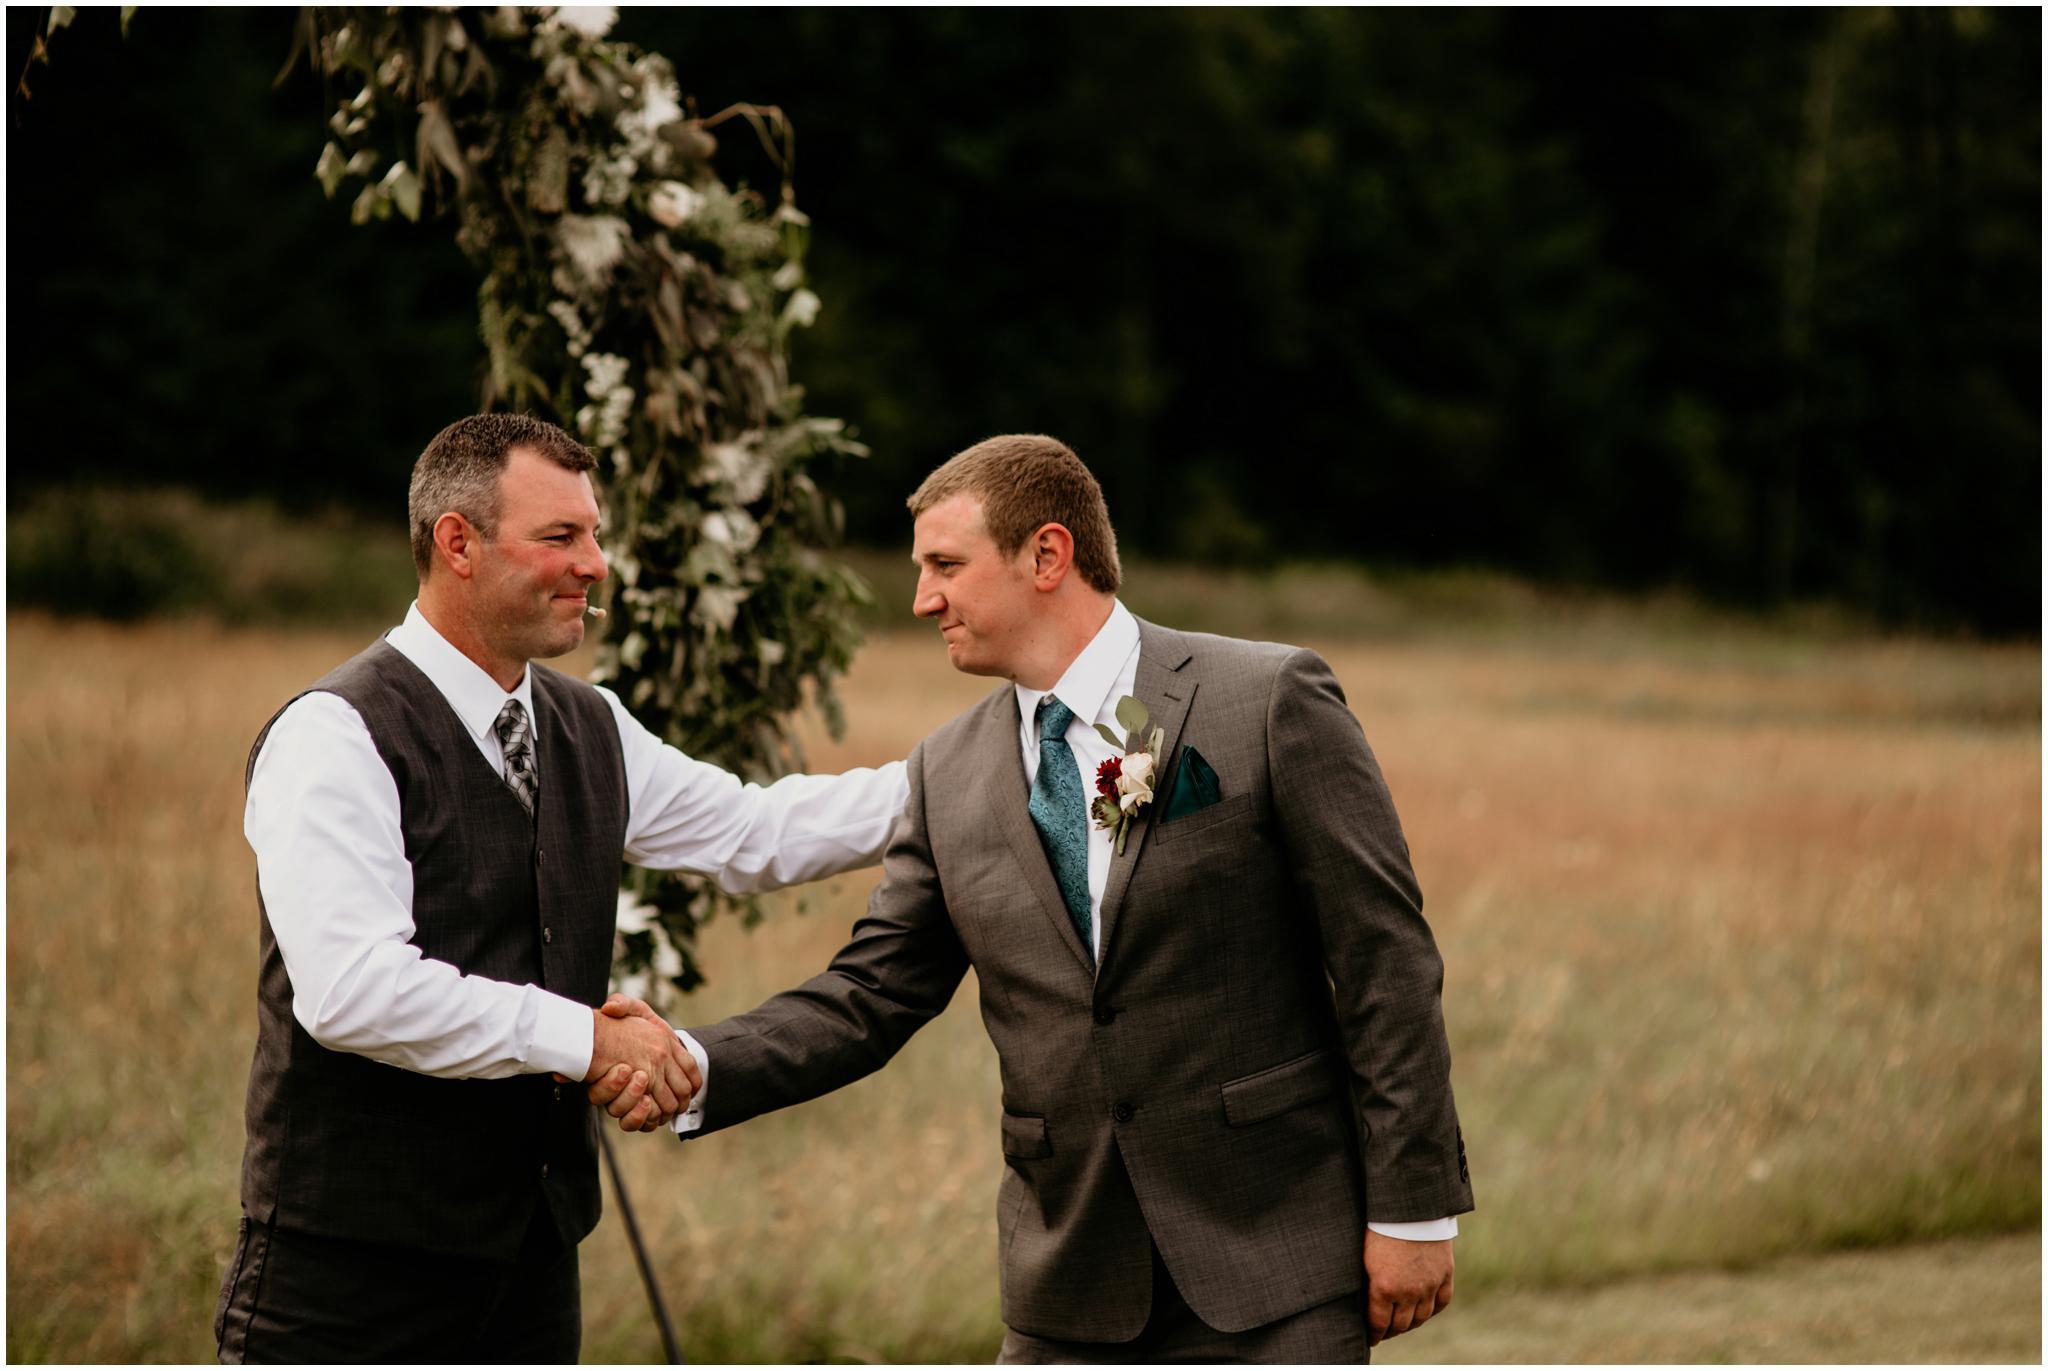 alex-and-matthew-three-cs-farm-venue-seattle-wedding-photographer-096.jpg